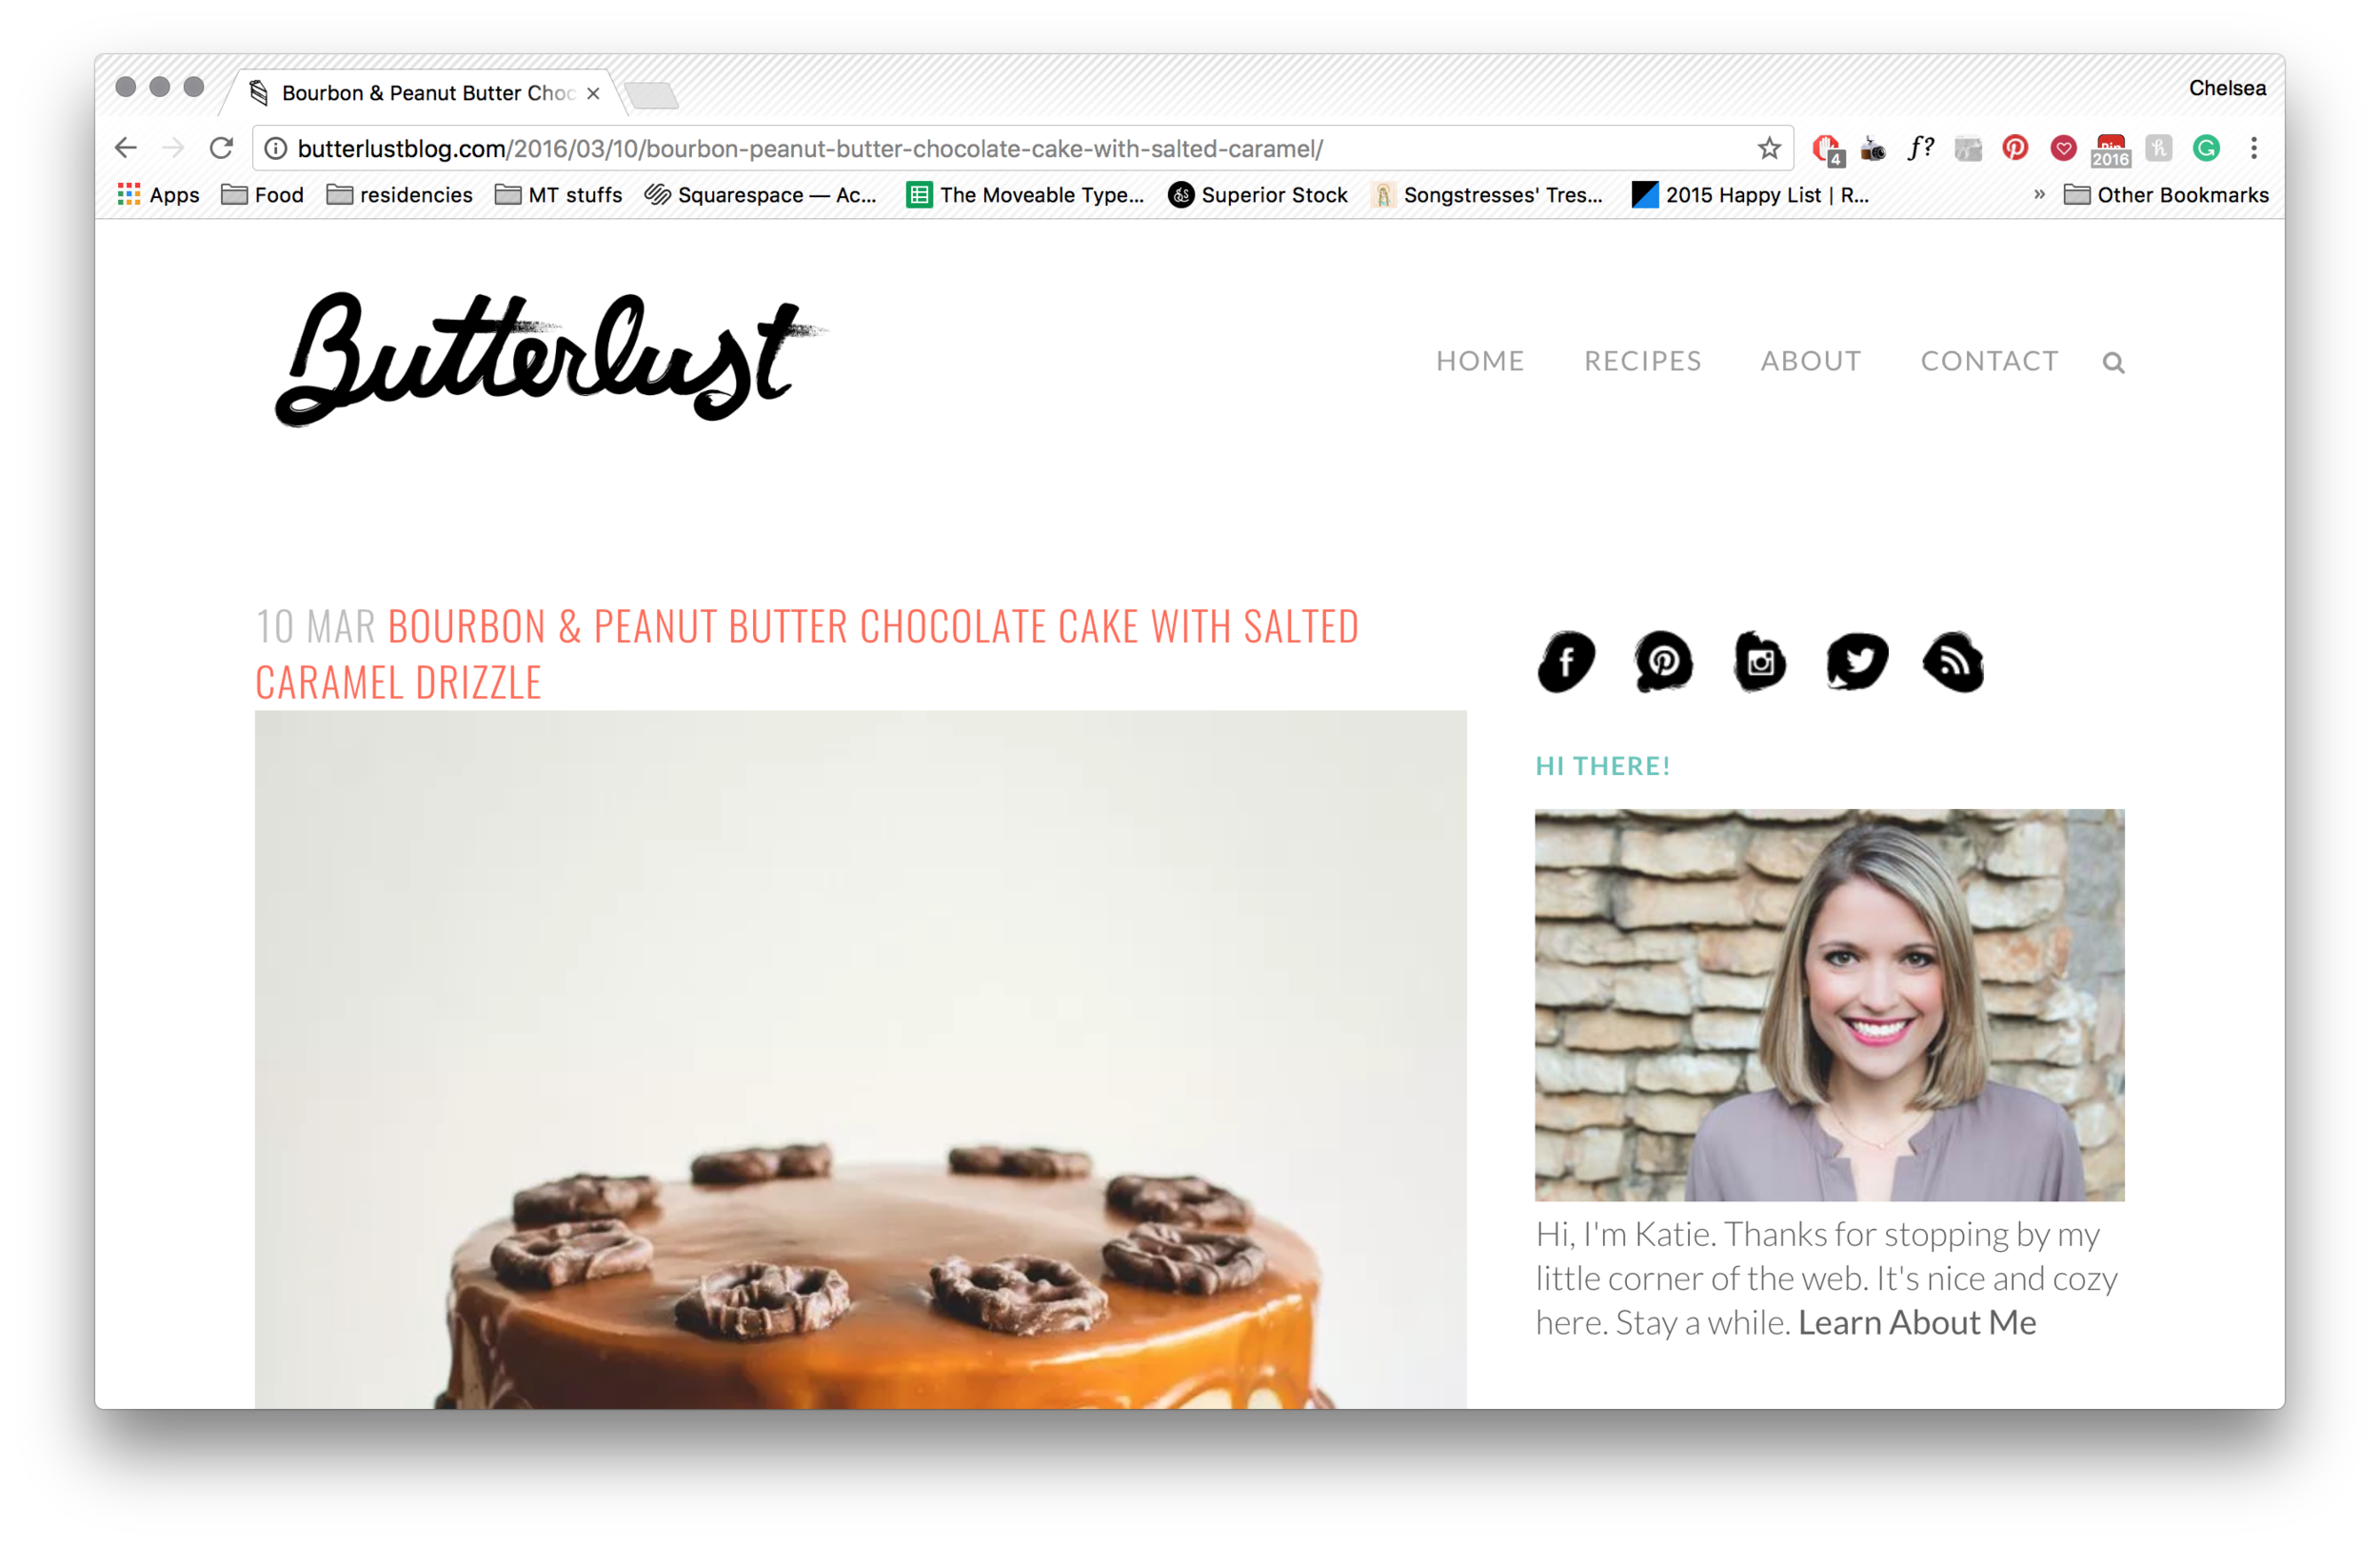 butterlust screencap.png